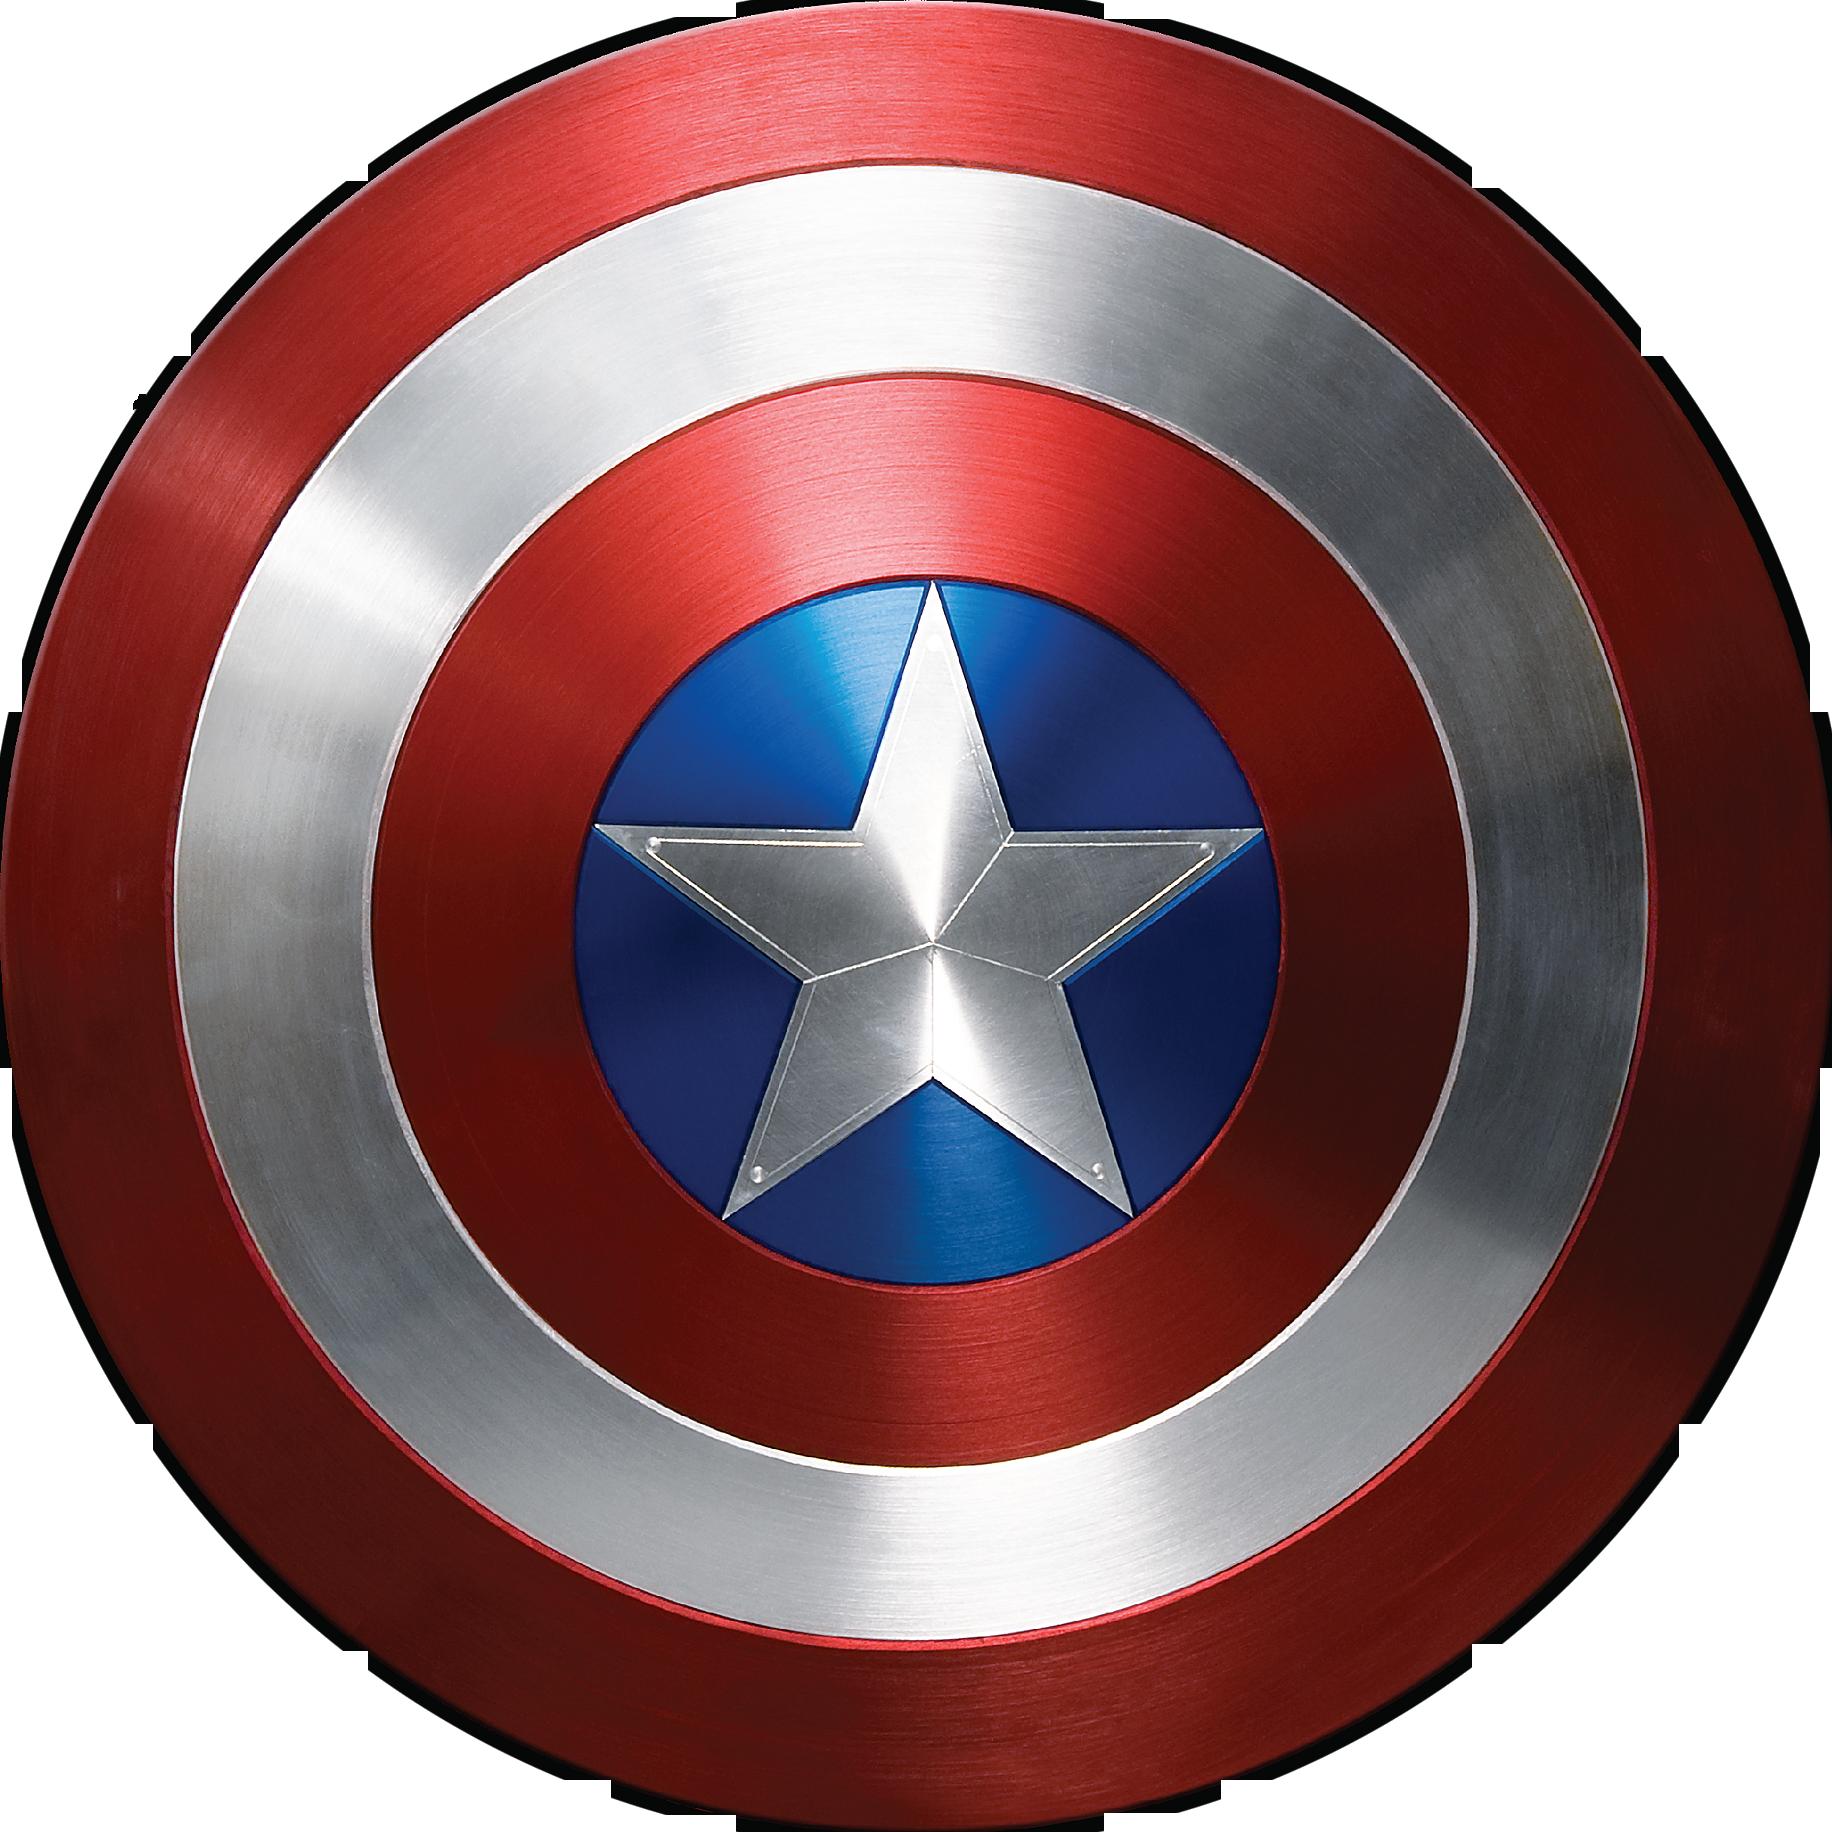 captain americas schild marvel filme wiki avengers superhelden comic helden the amazing. Black Bedroom Furniture Sets. Home Design Ideas